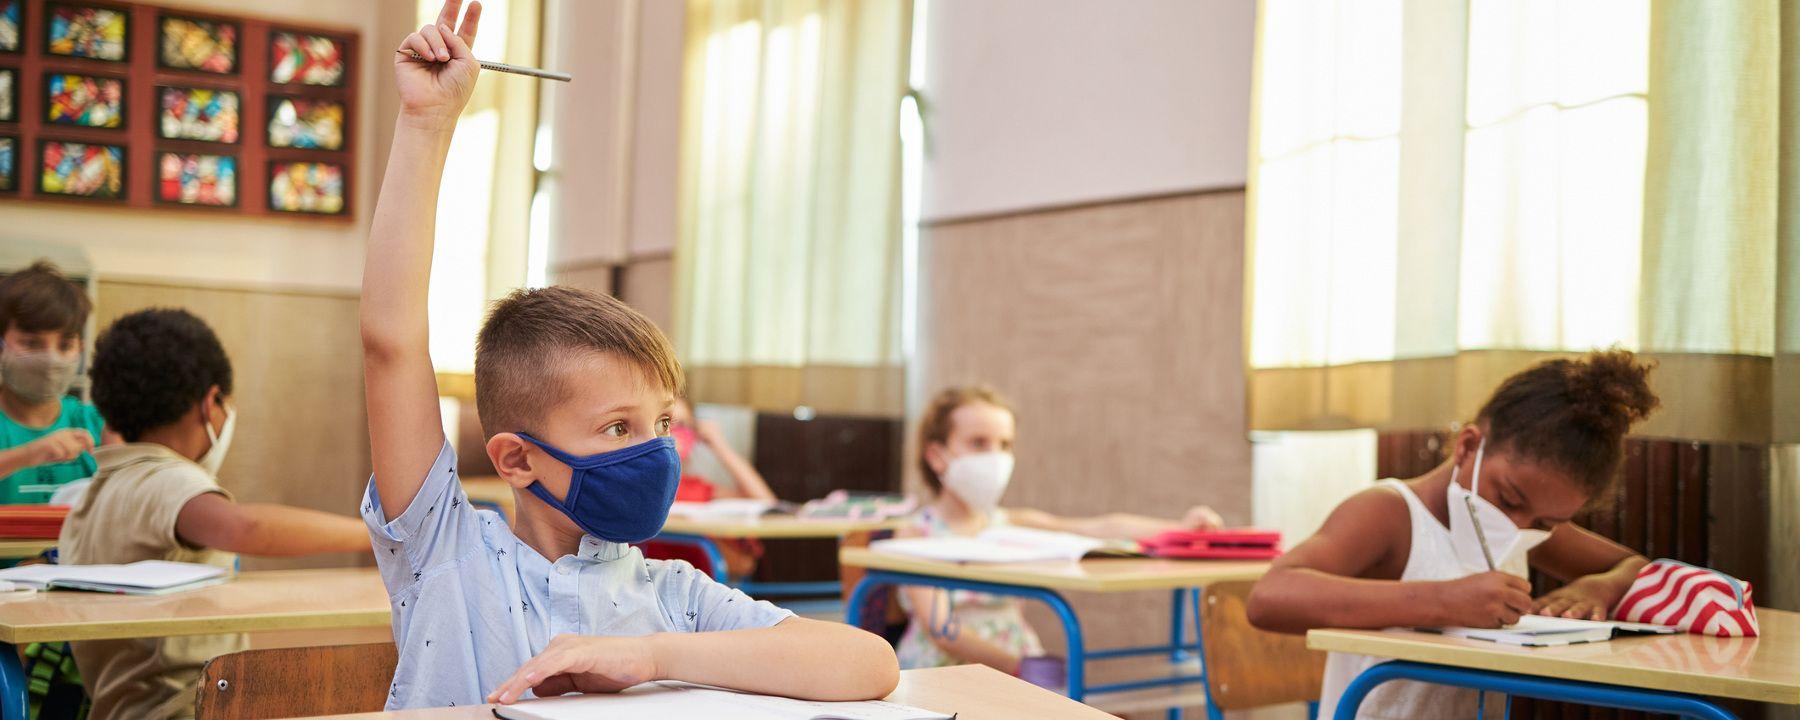 Shrinking Quarantine